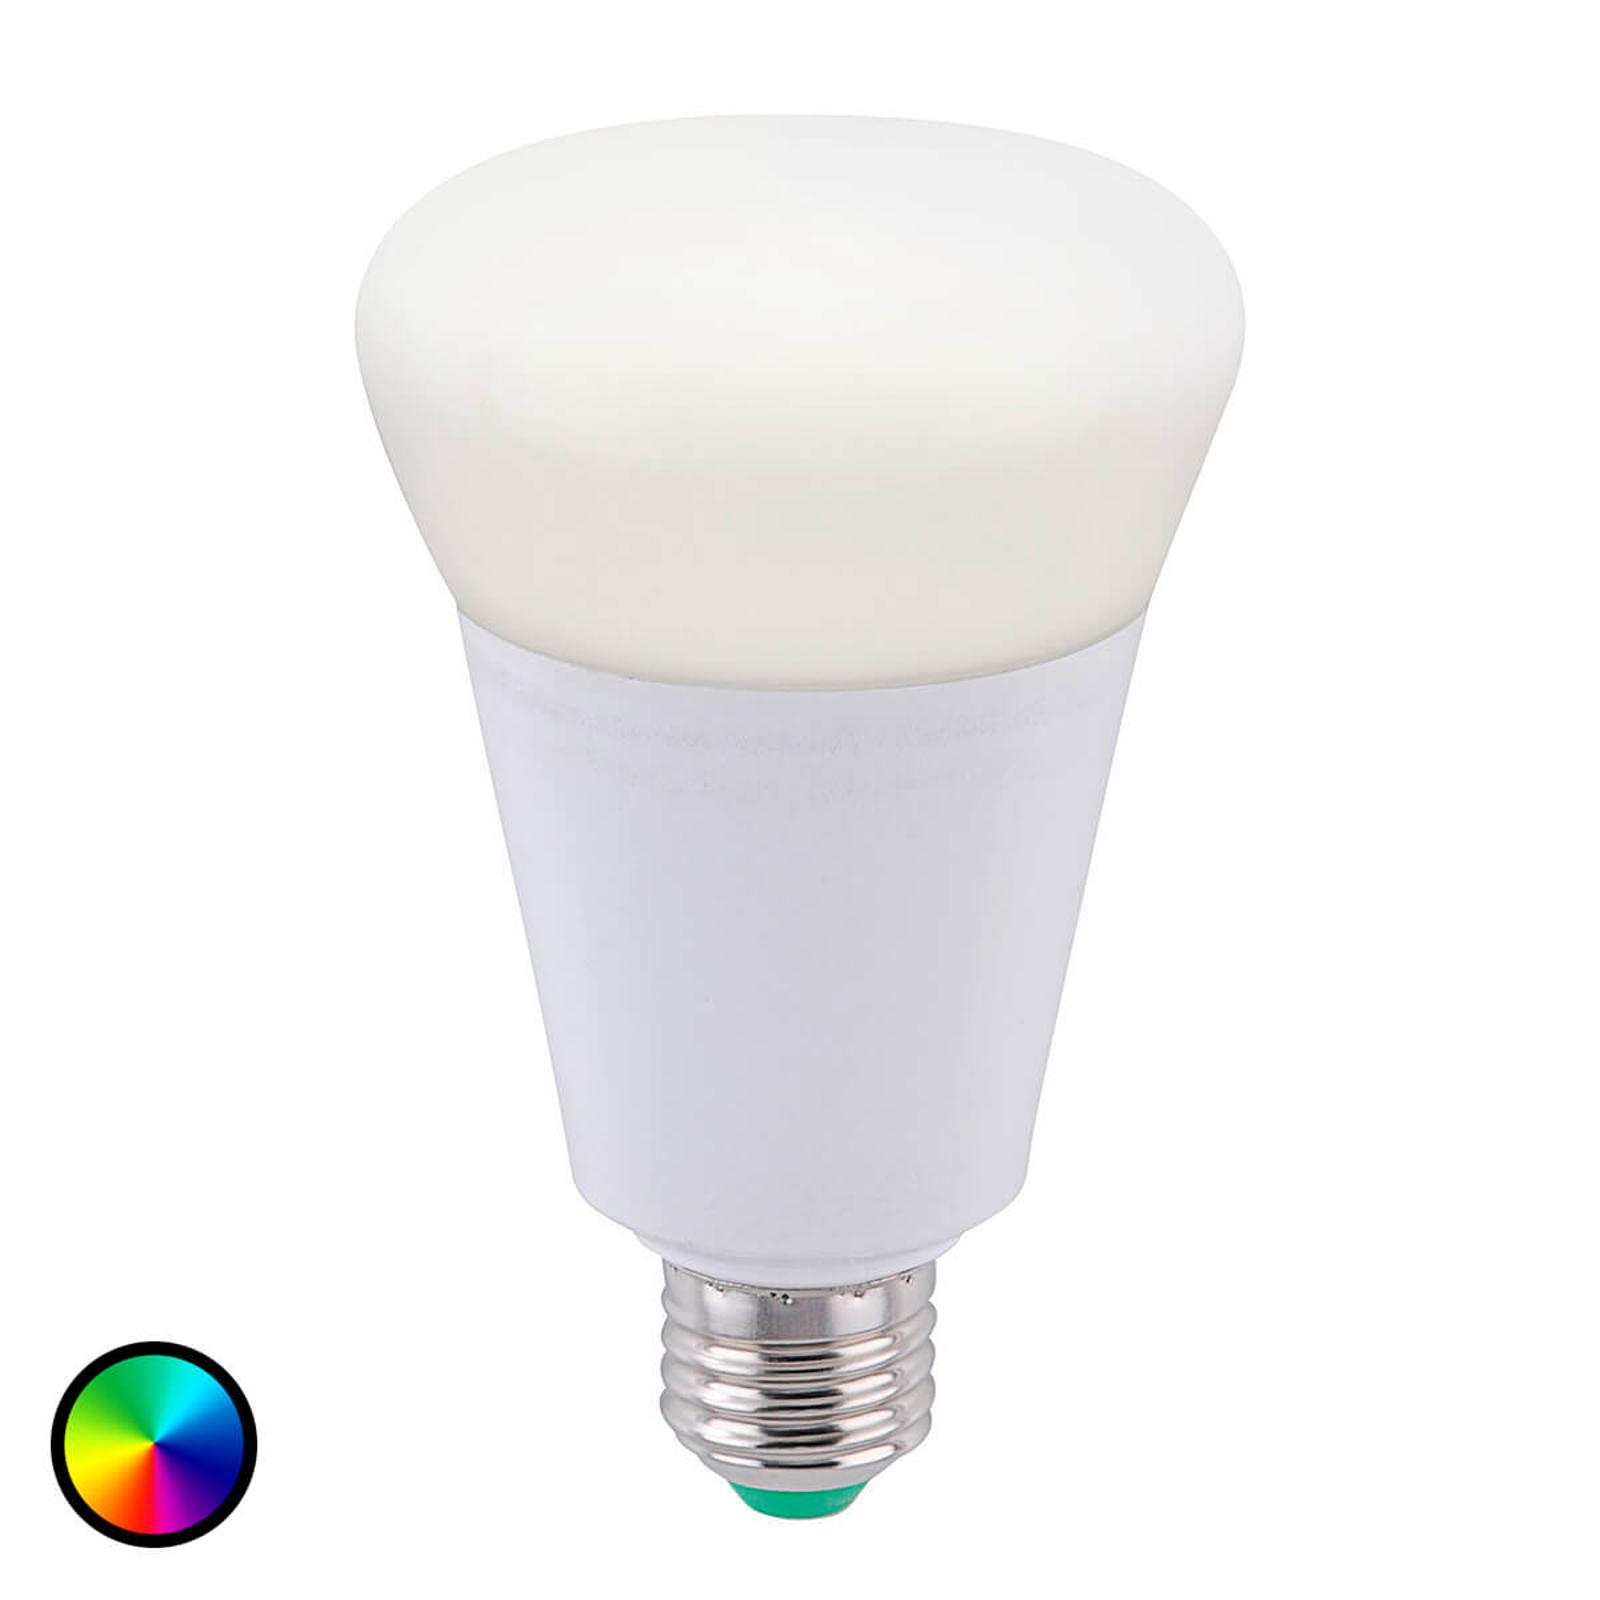 Lampa Lola LED RGB, 14W, E27, 1100 lumenów